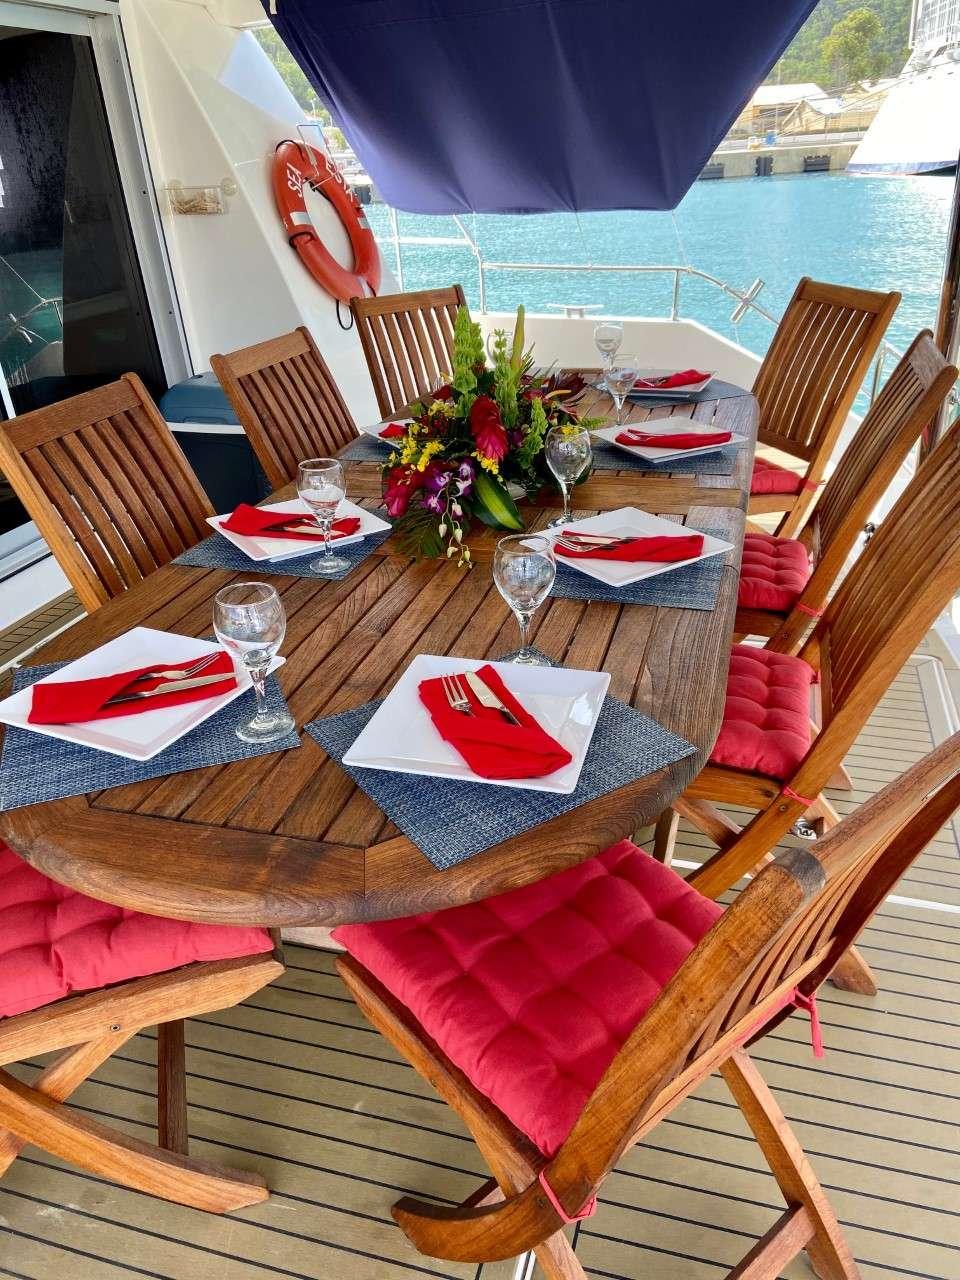 Enjoy the large, open  aft deck for alfresco dining